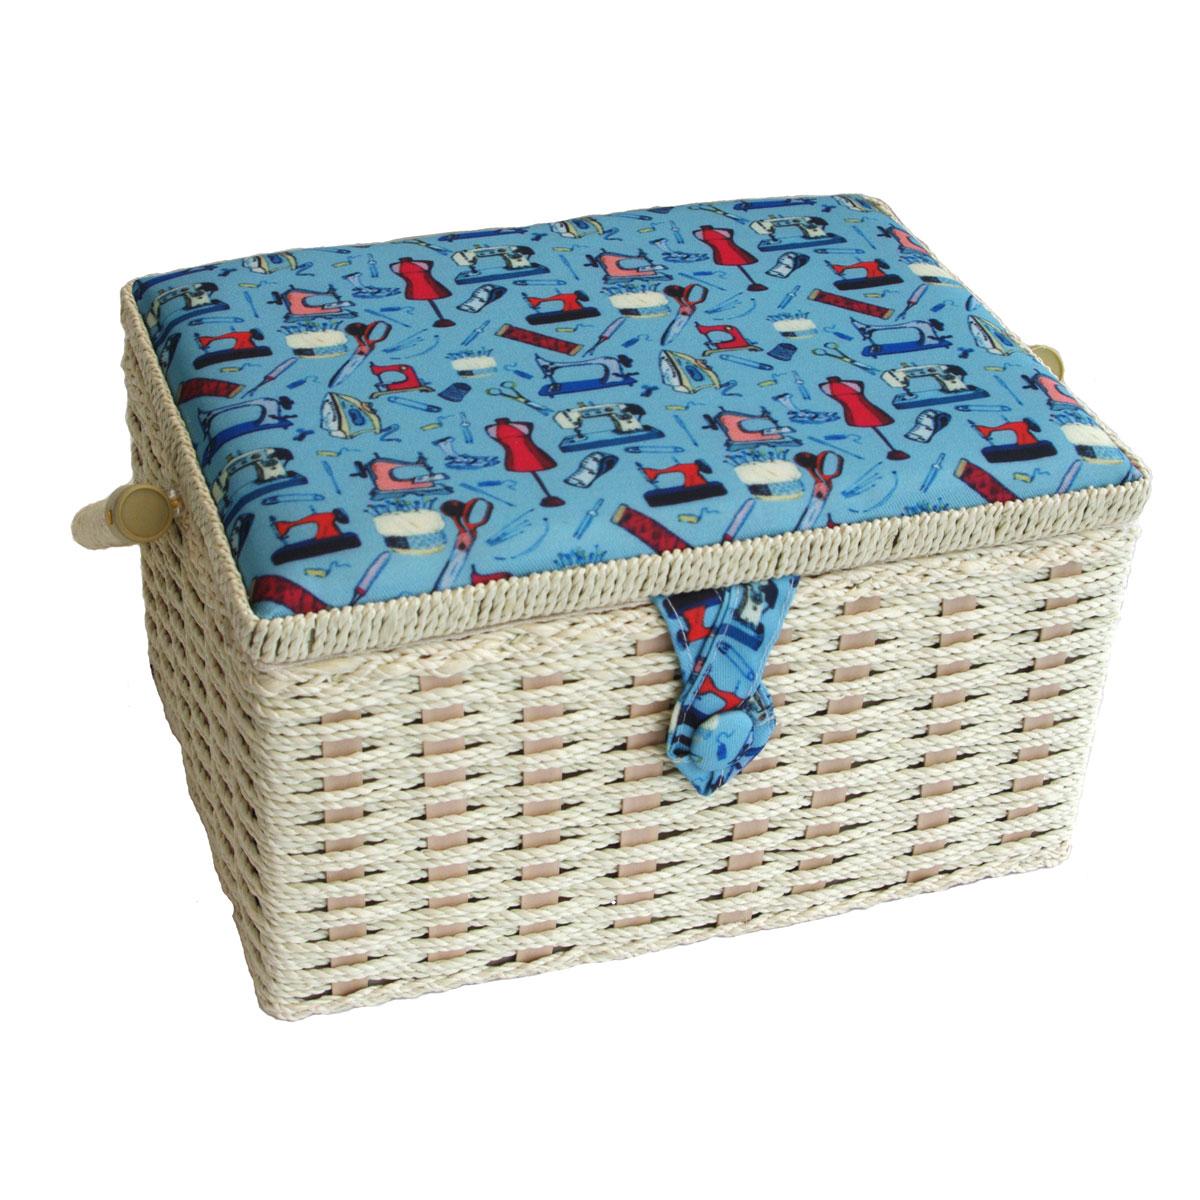 Notions Medium Sewing Basket Multi 26 x 19 x 15cmSewing Online FM-008